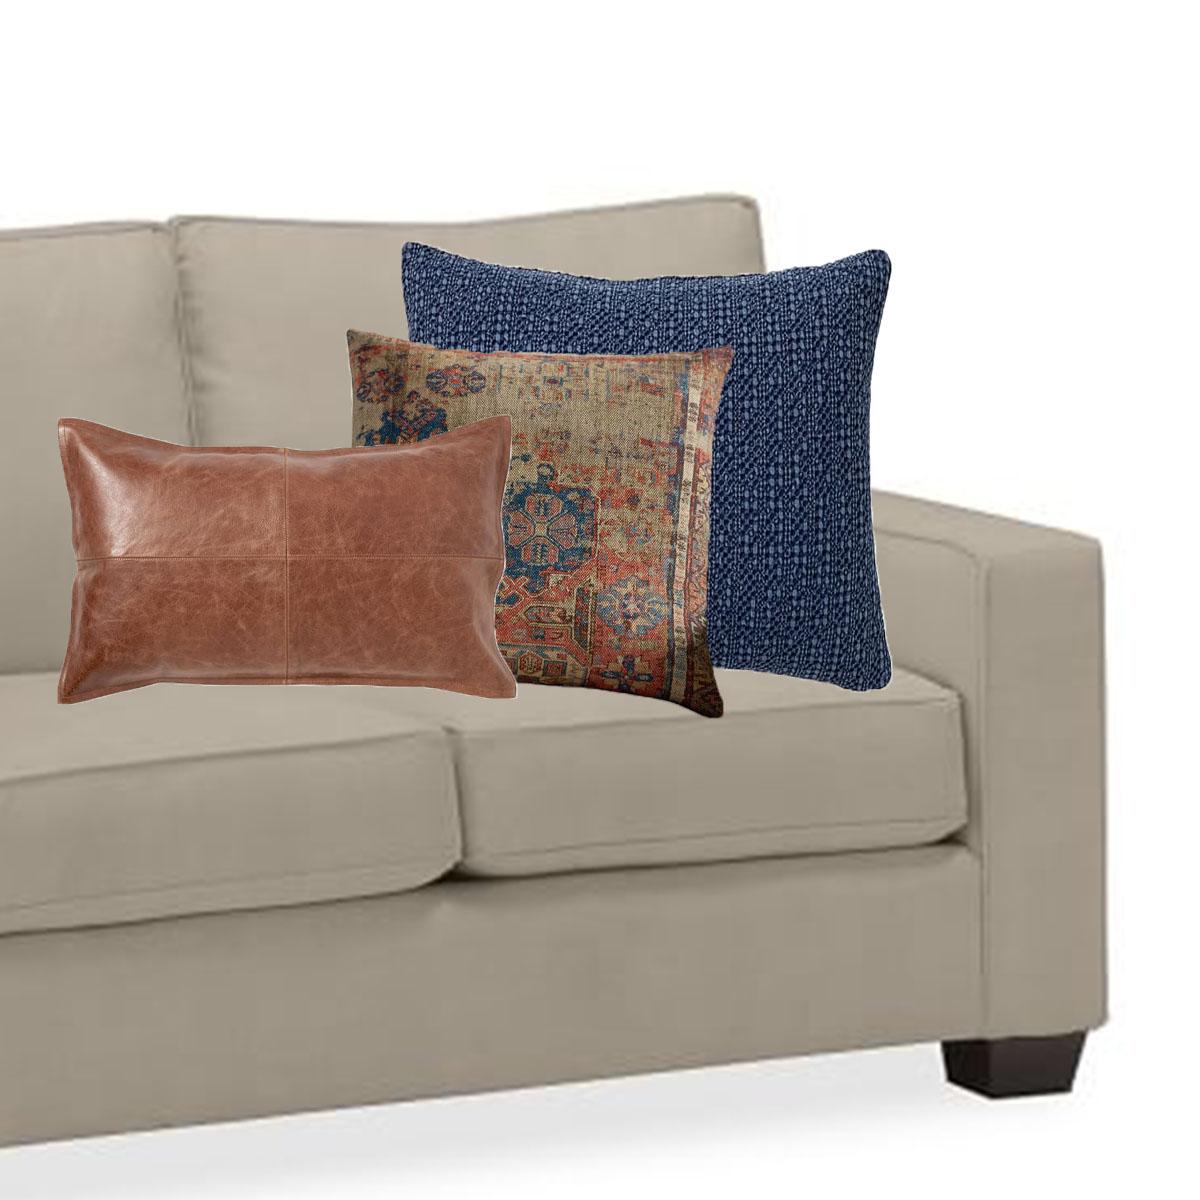 Interior Design 101 How To Coordinate Sofa Pillows Like A Design